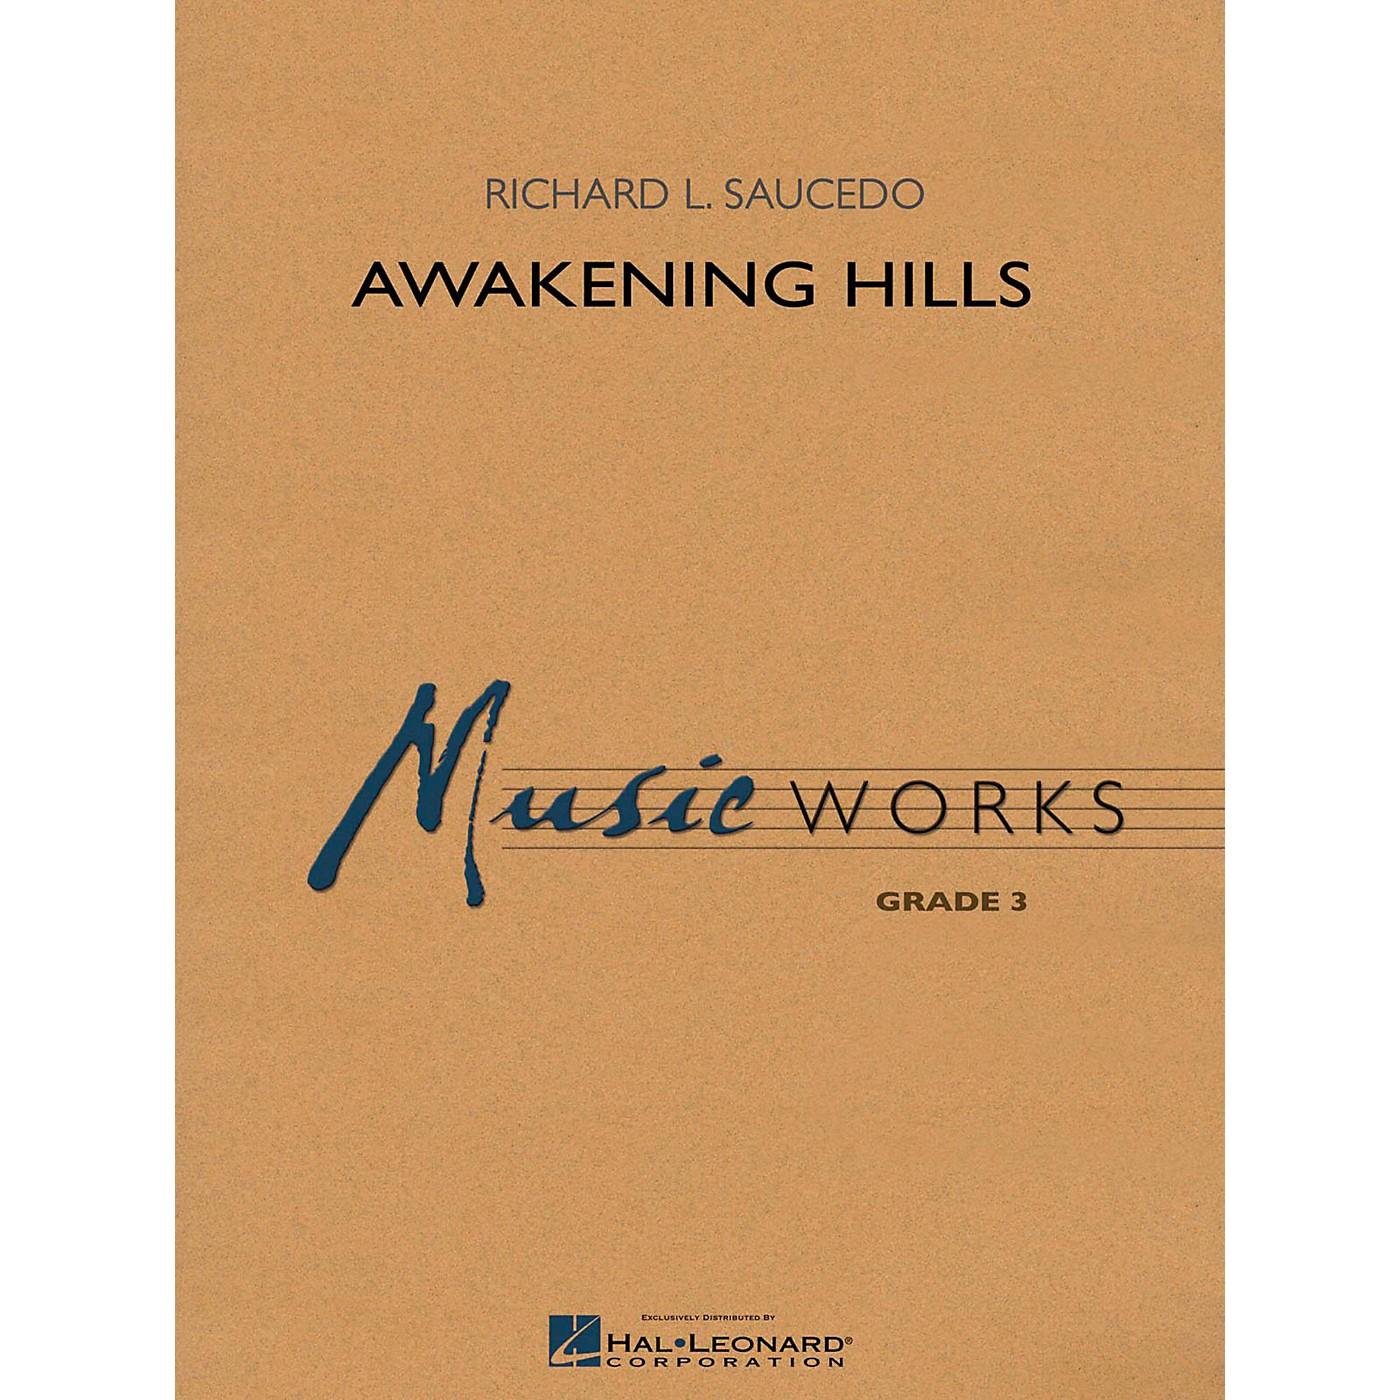 Hal Leonard Awakening Hills - MusicWorks Grade 3 Concert Band thumbnail